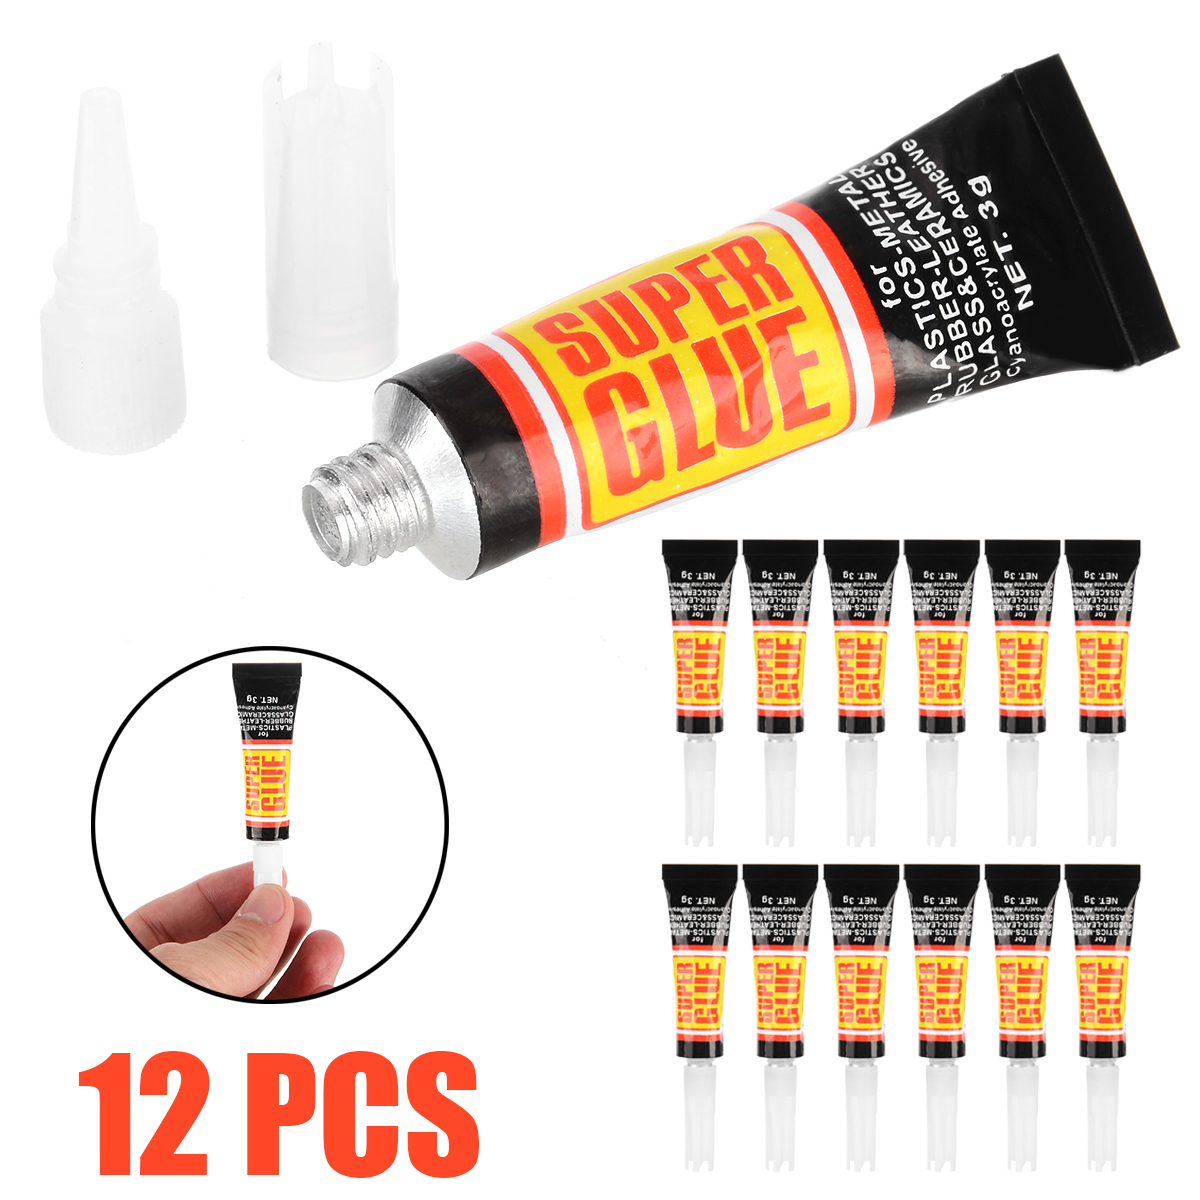 12pcs 3g Super Glue Quick Dry Clear Liquid Gel Practical Super Glue Instant Strong Adhesive For Metal Glass Plastics Repair